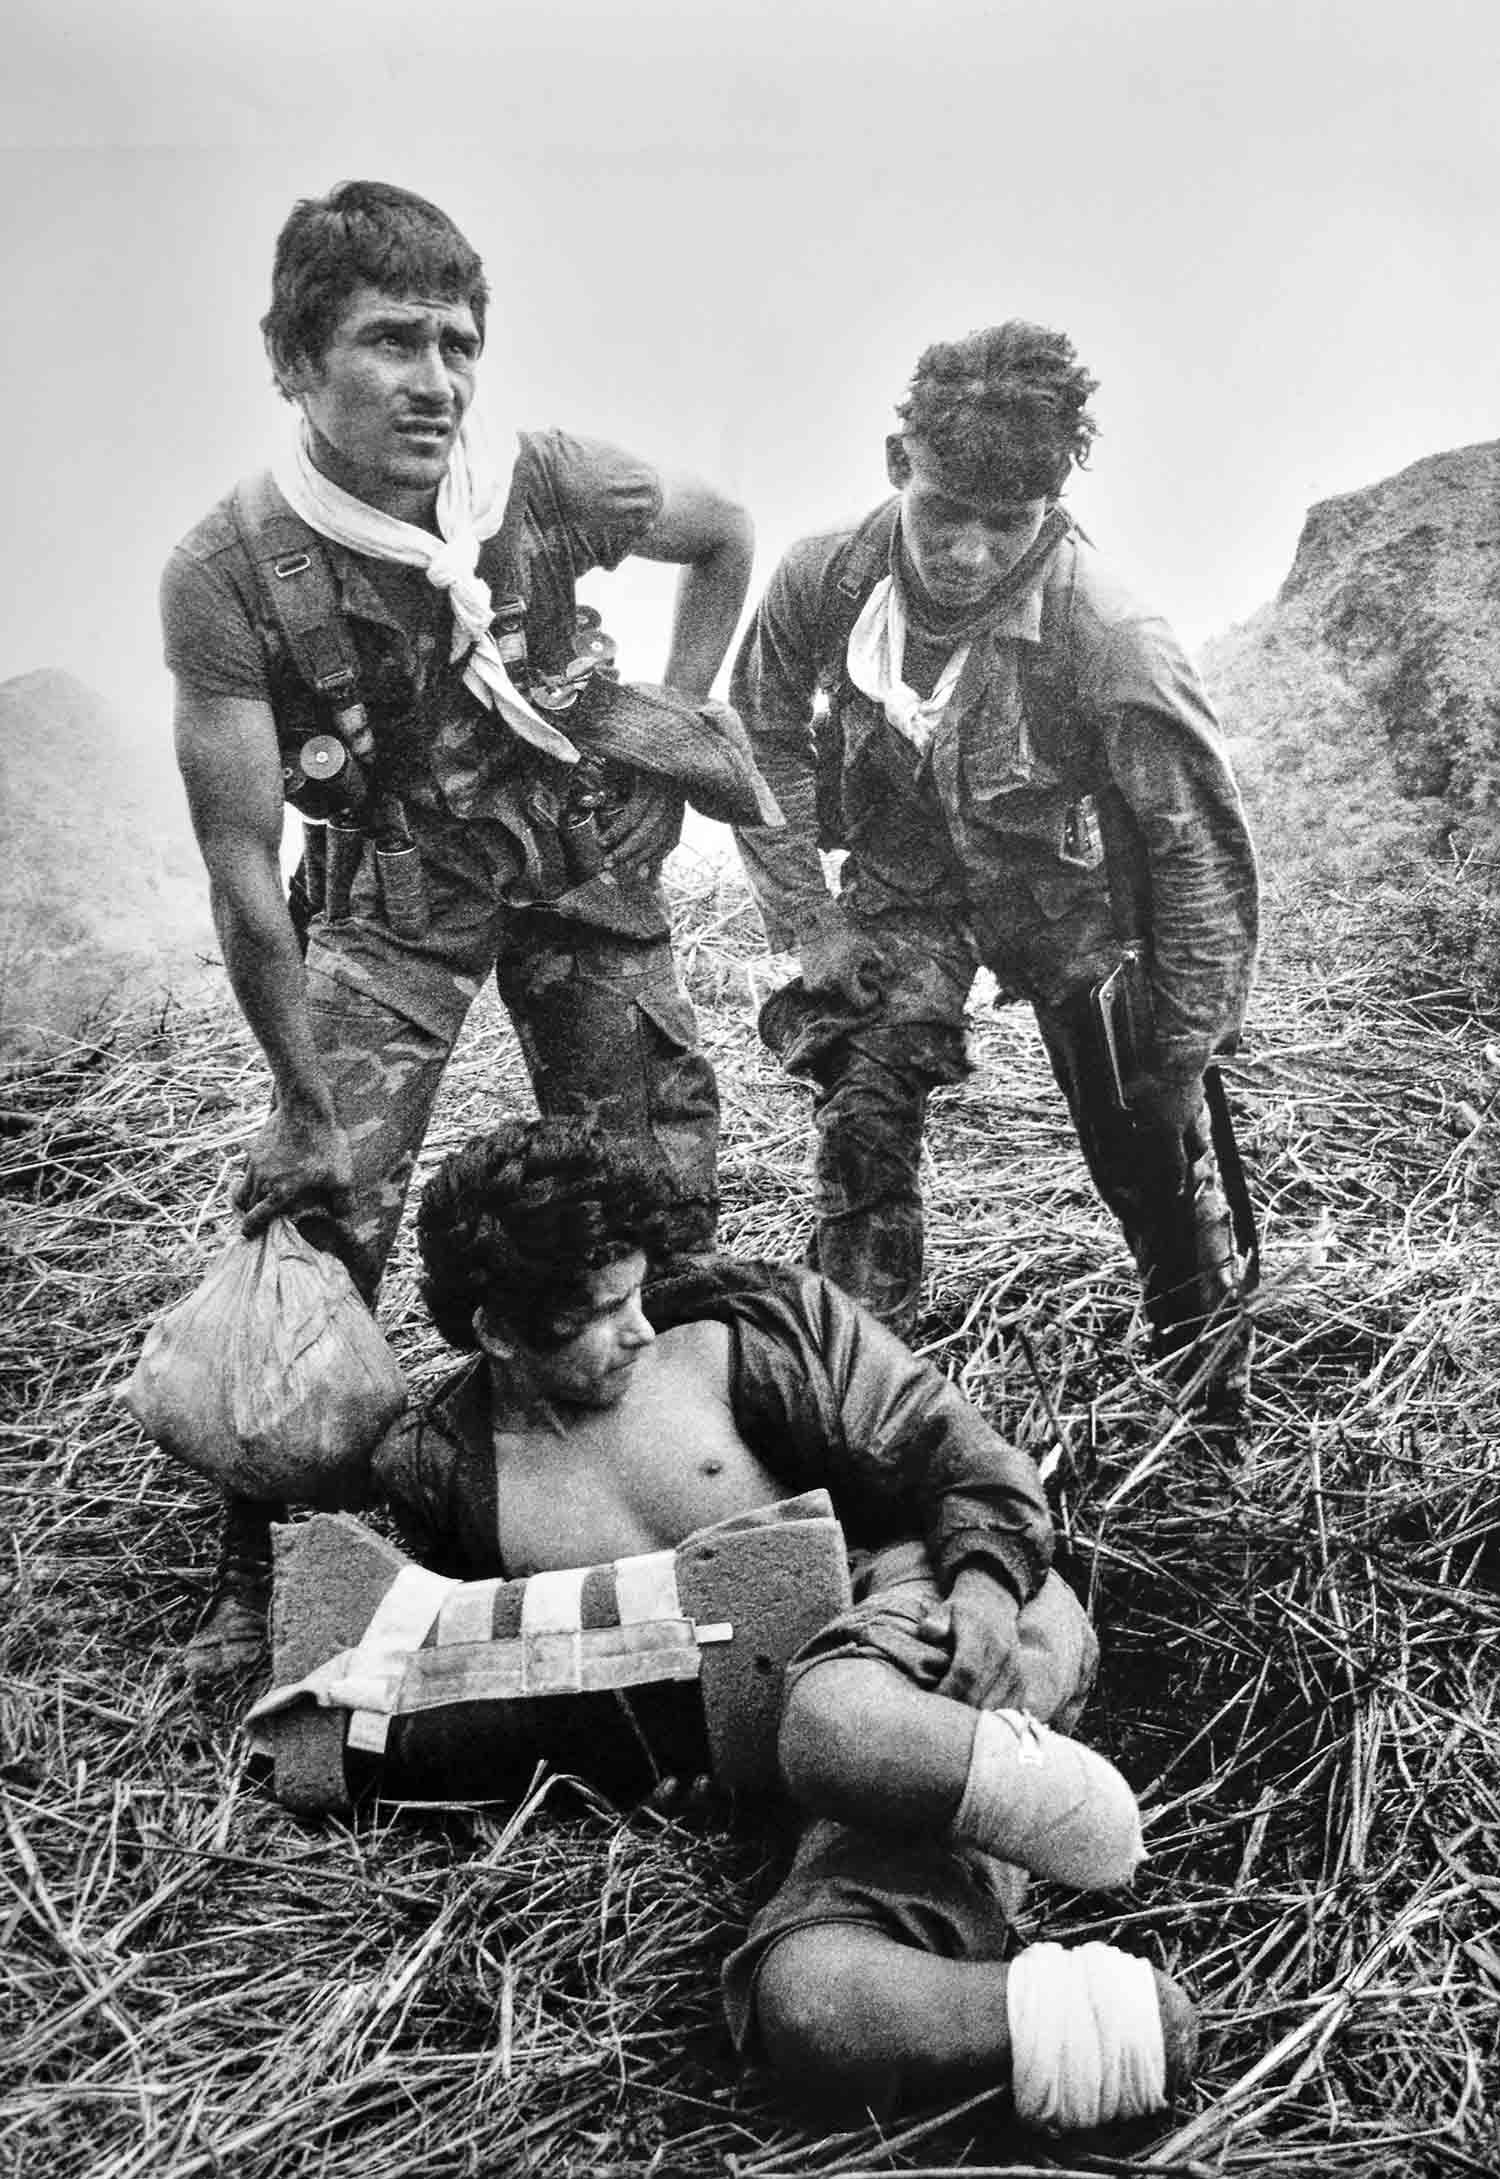 30-Sodados de ejercito auxilian a un guerrillero del FMLN herido